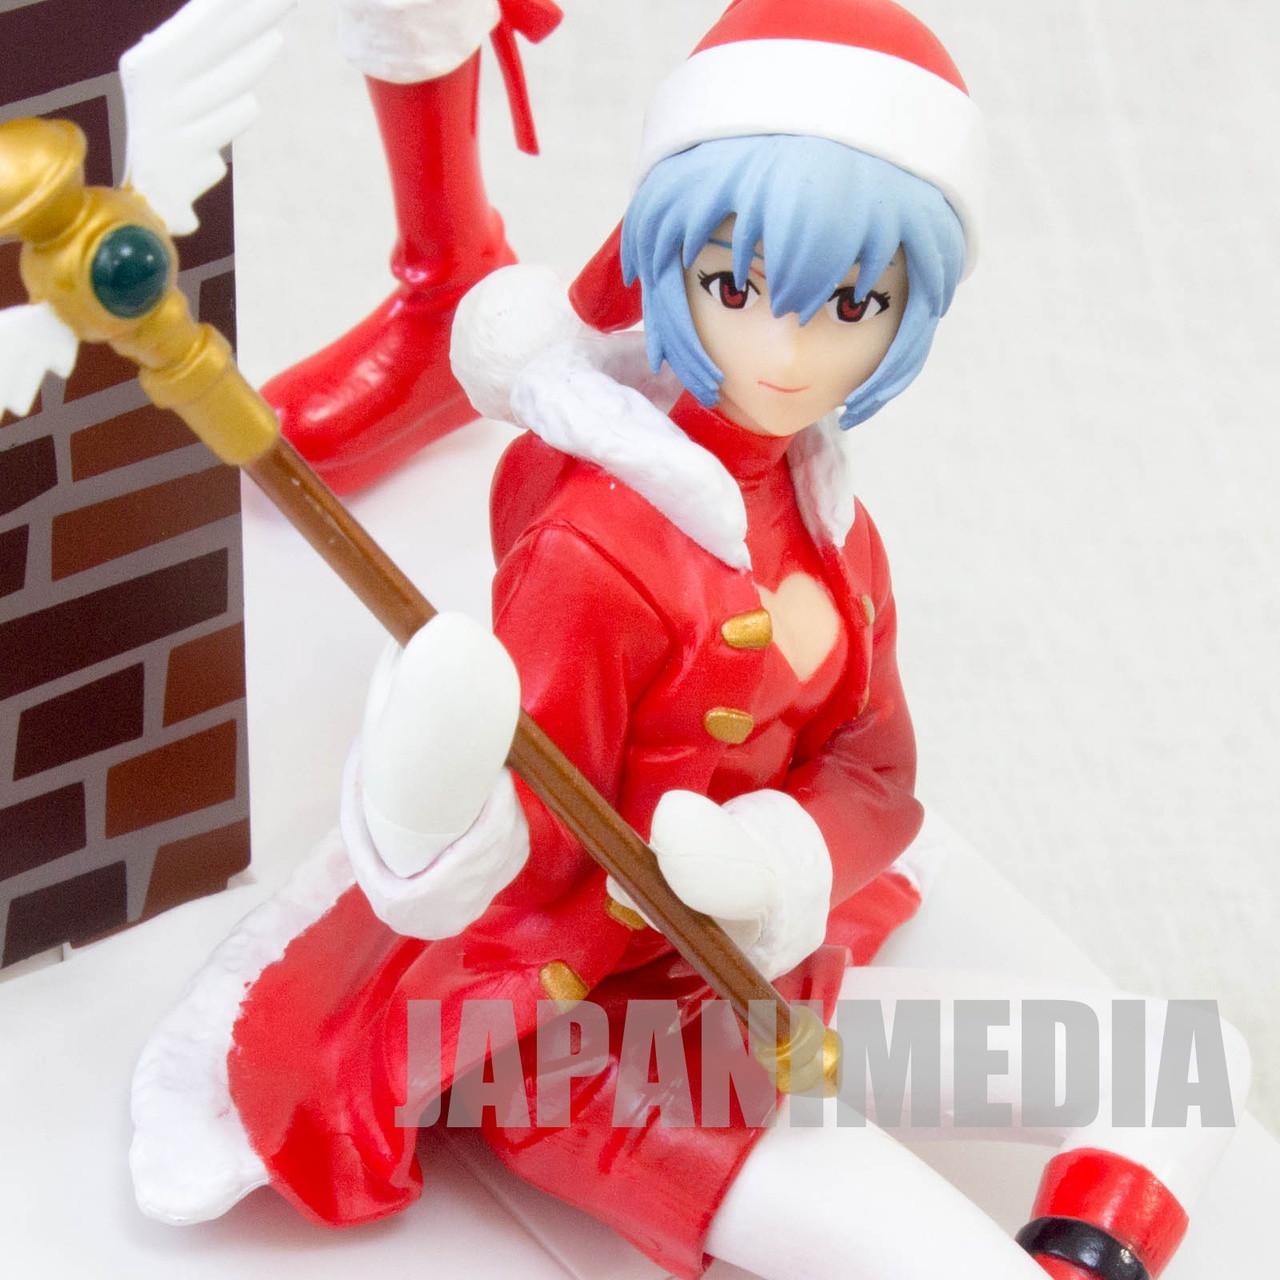 Evangelion Cake Asuka Langley & Rei Ayanami Christmas Santa Figure Bandai  JAPAN